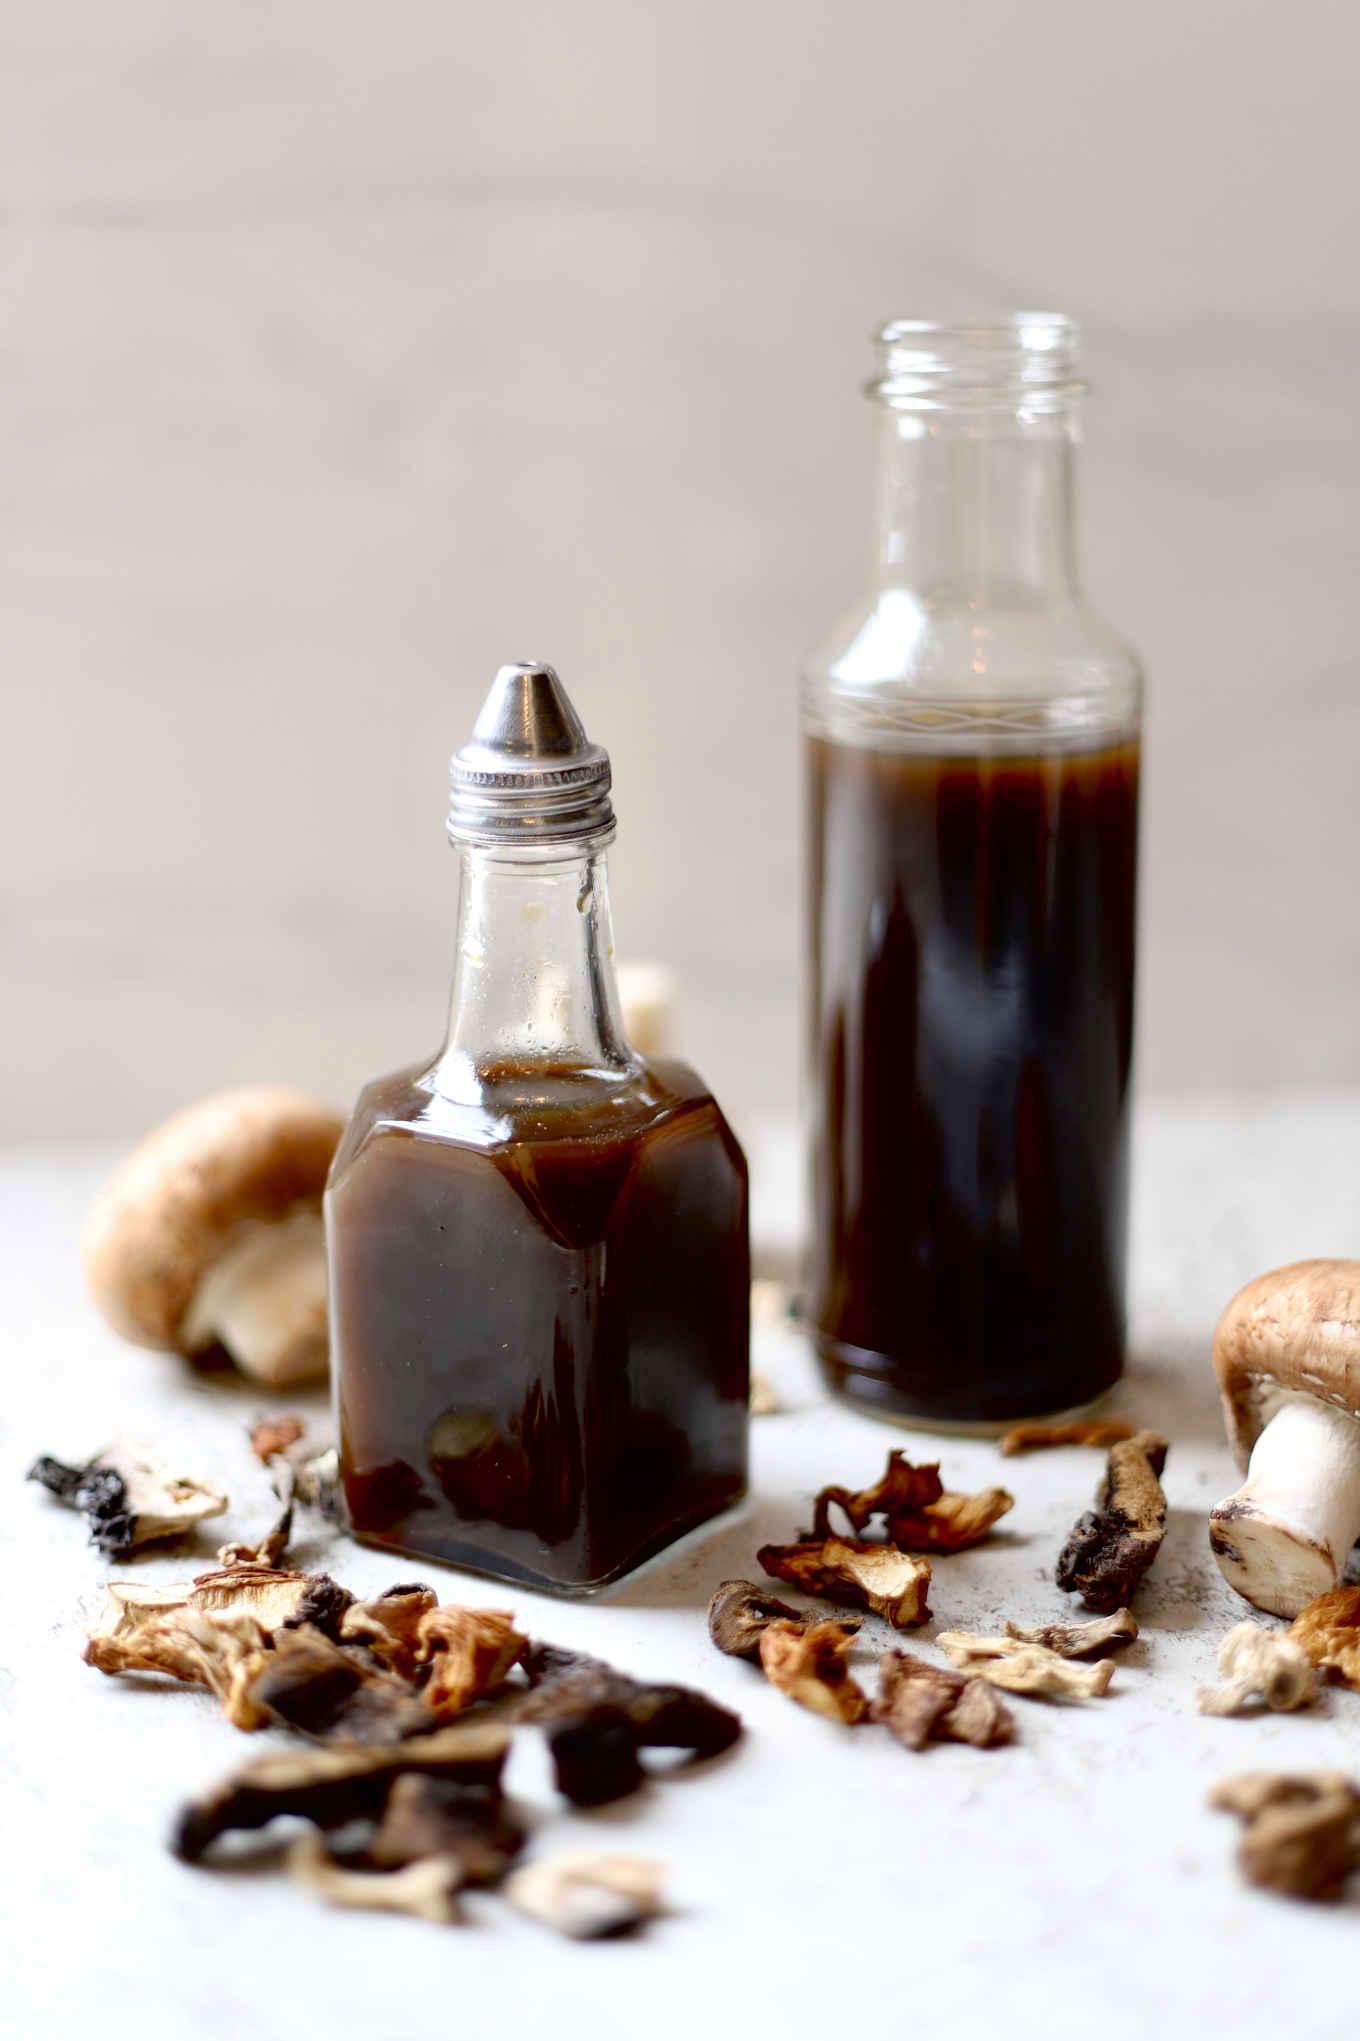 bottled mushroom ketchup